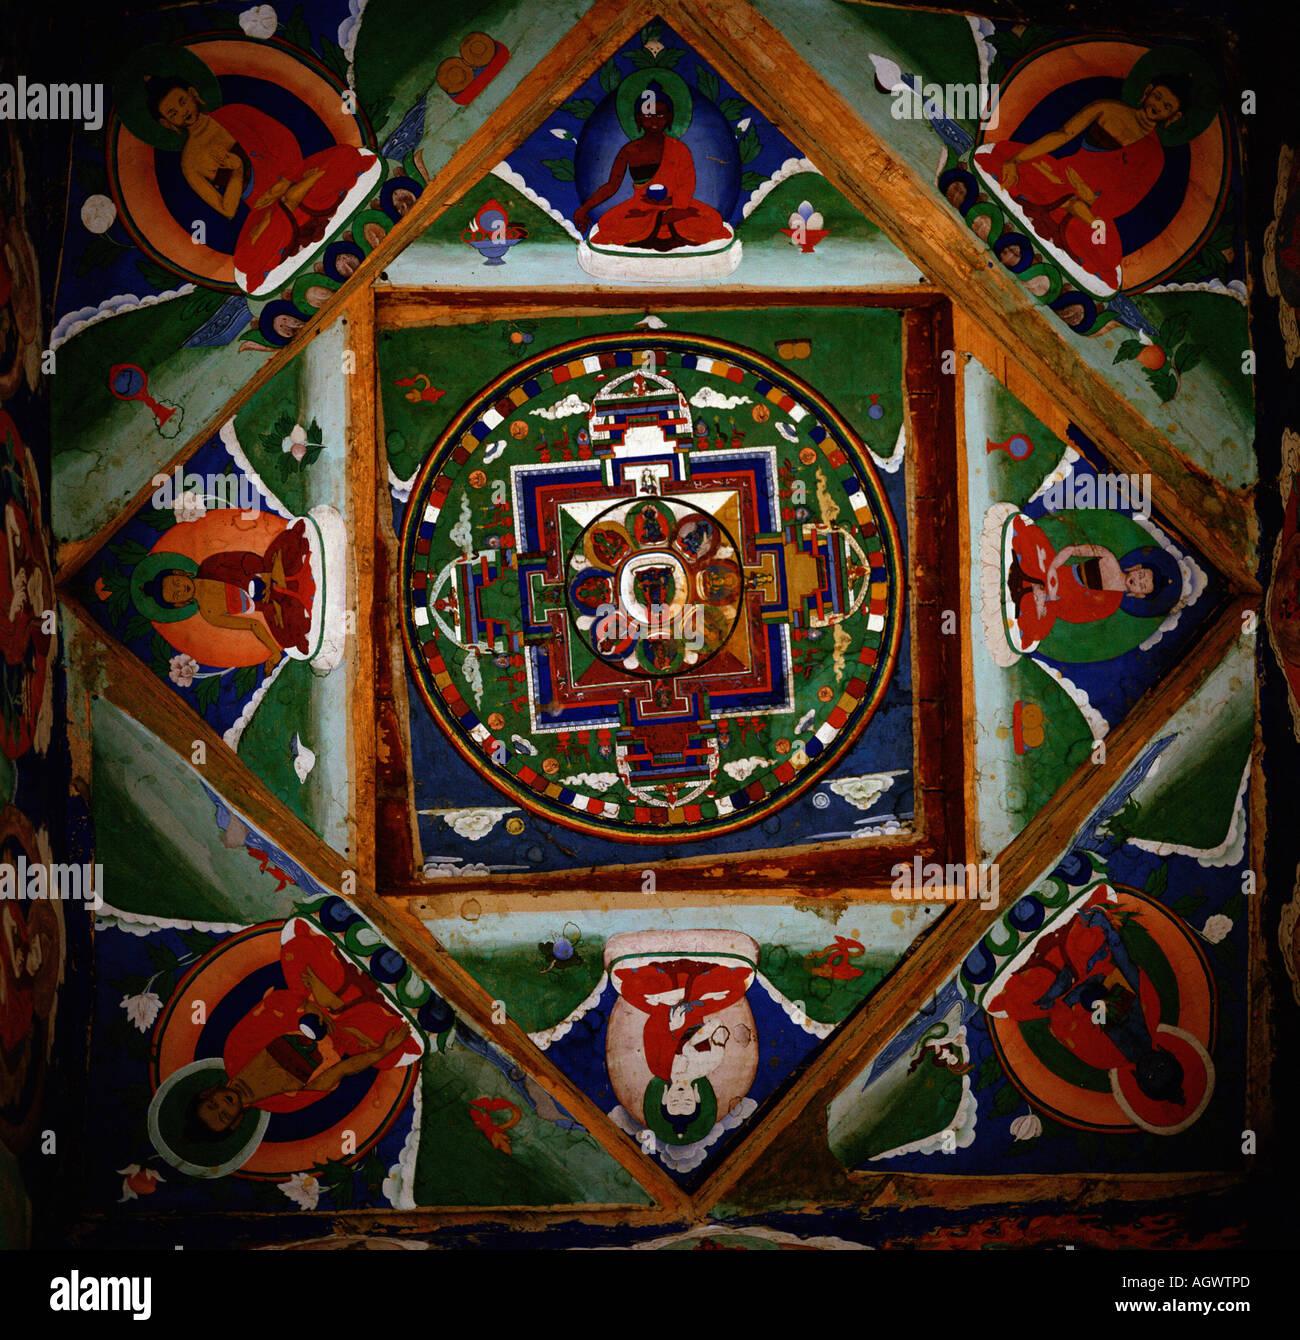 Mandala - Stock Image